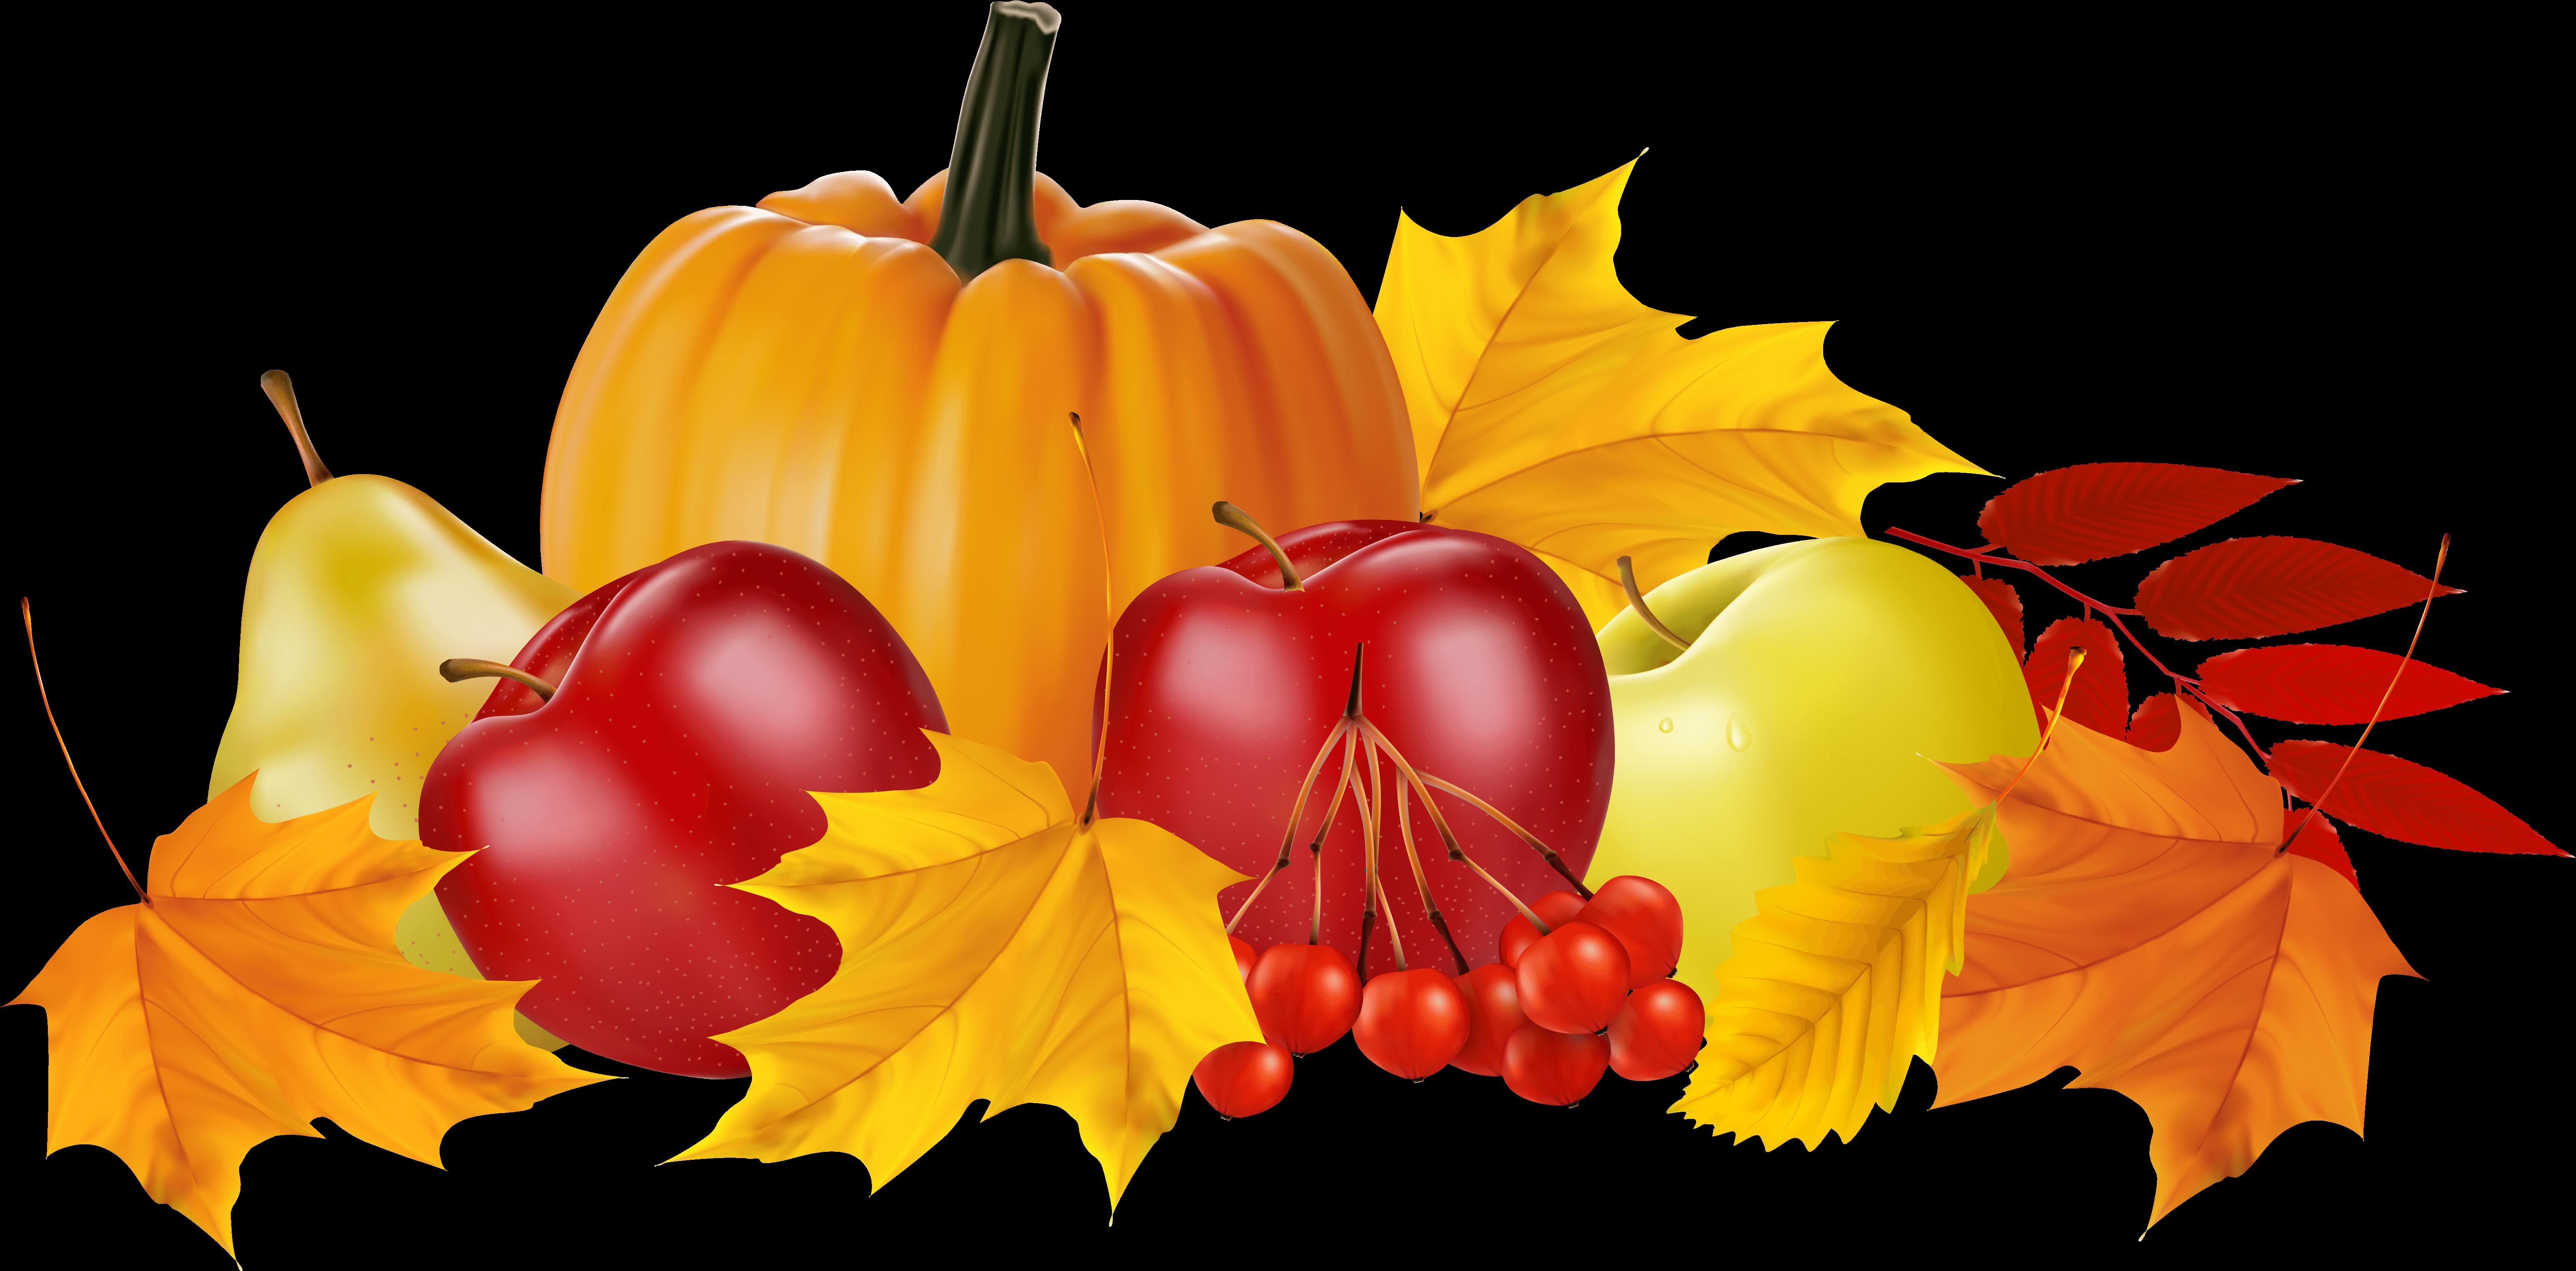 Autumn Pumpkin And Fruits Png Clipart Image Transparent.